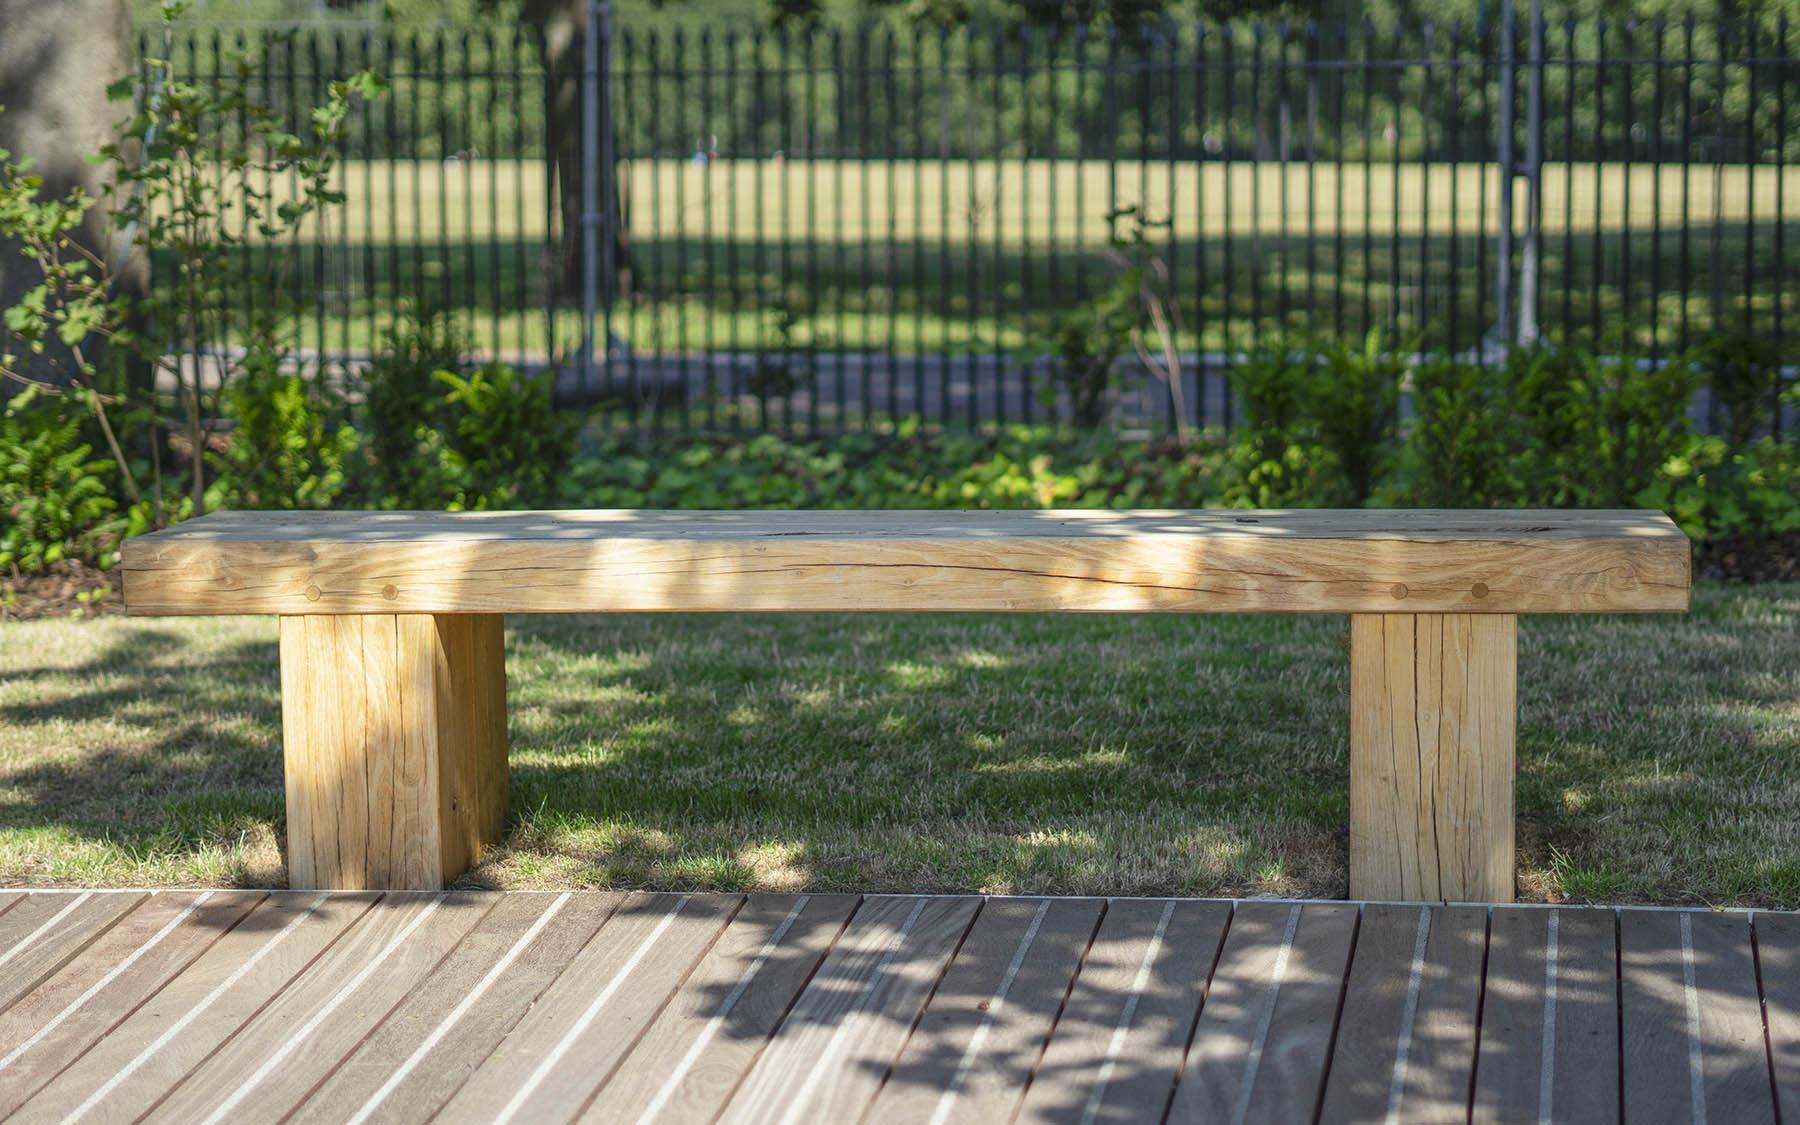 natural playground equipment regents park